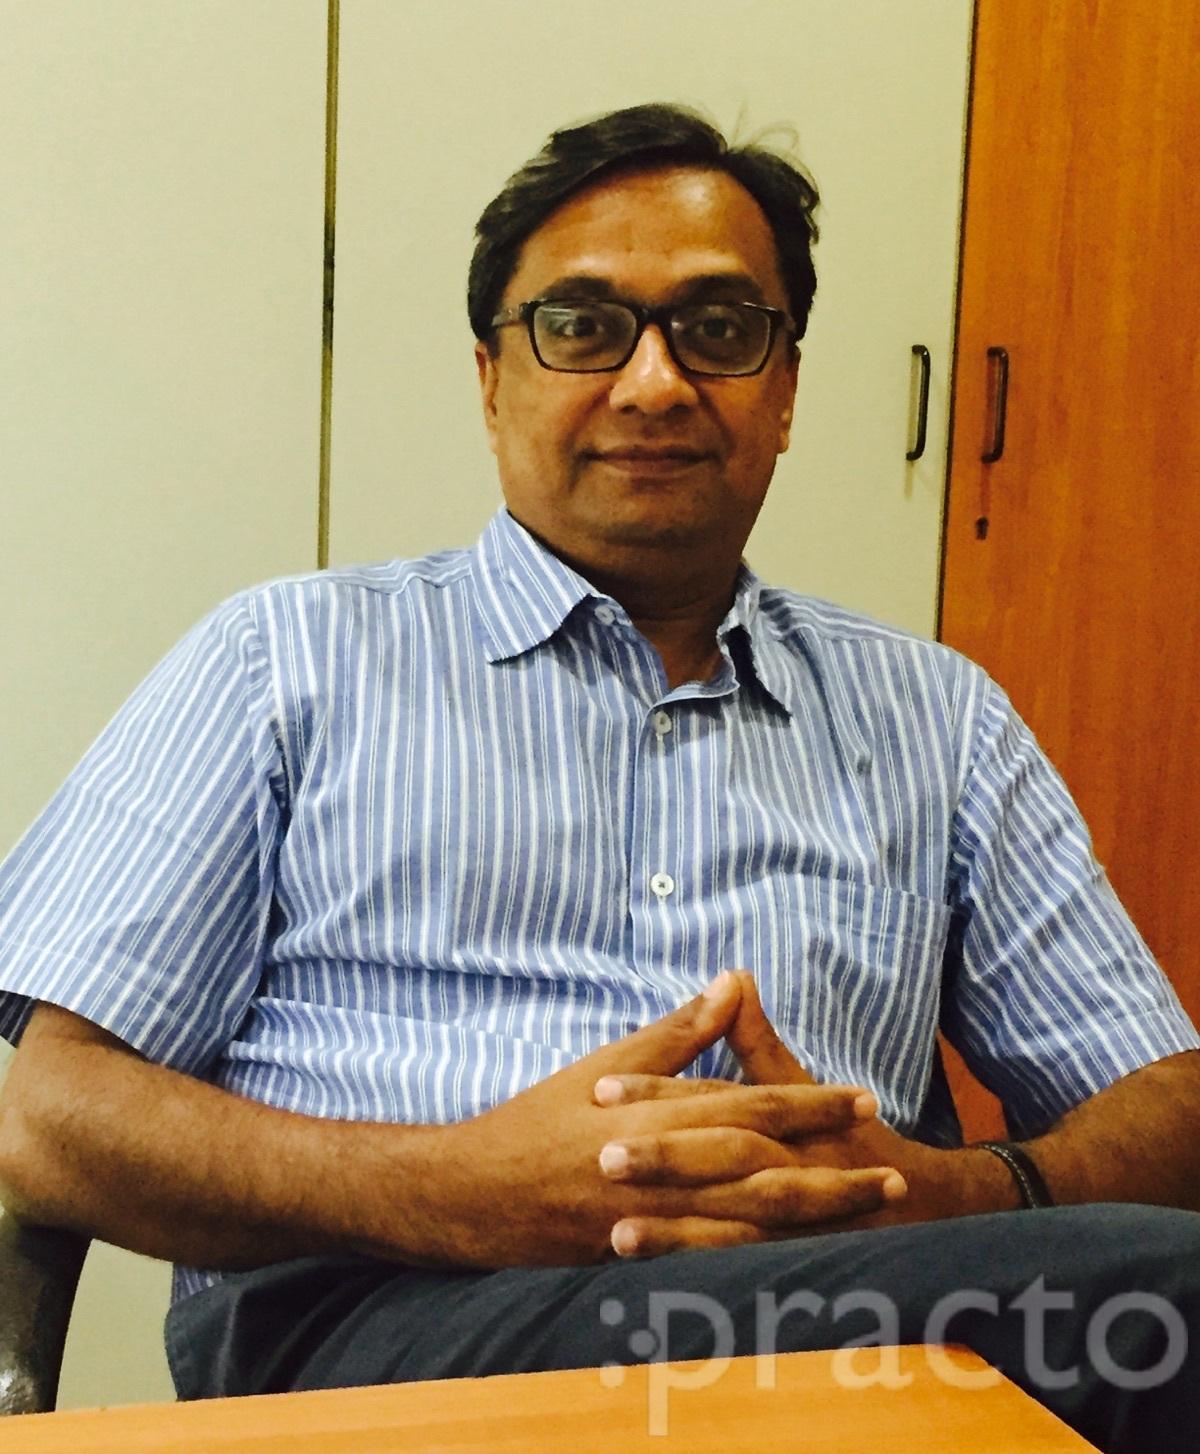 Dr. Suneel Shah - Neurosurgeon